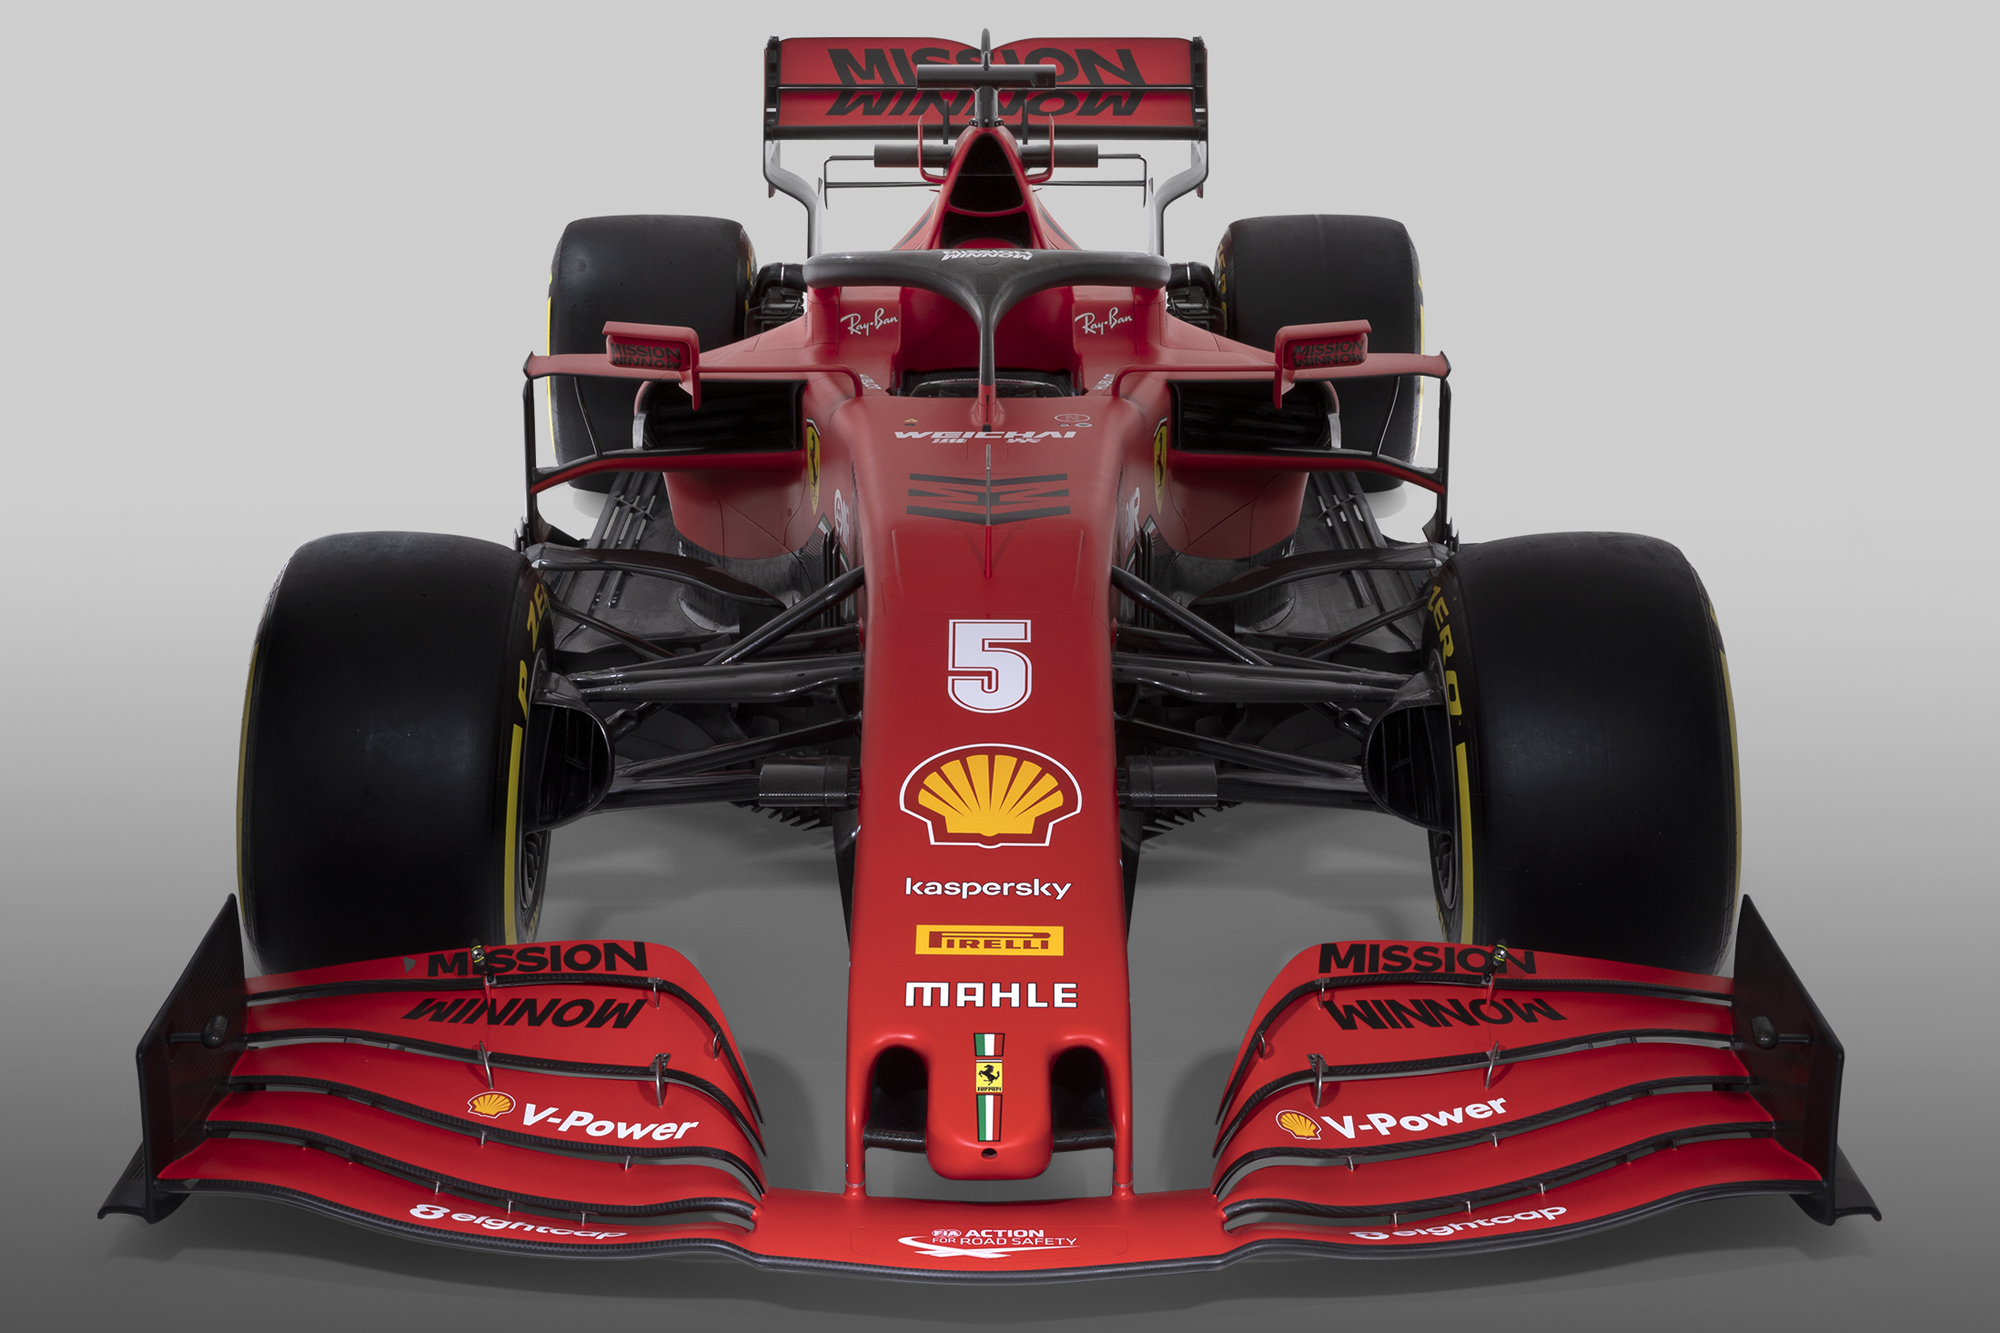 Gary Anderson S Verdict On Ferrari S 2020 F1 Car The Race